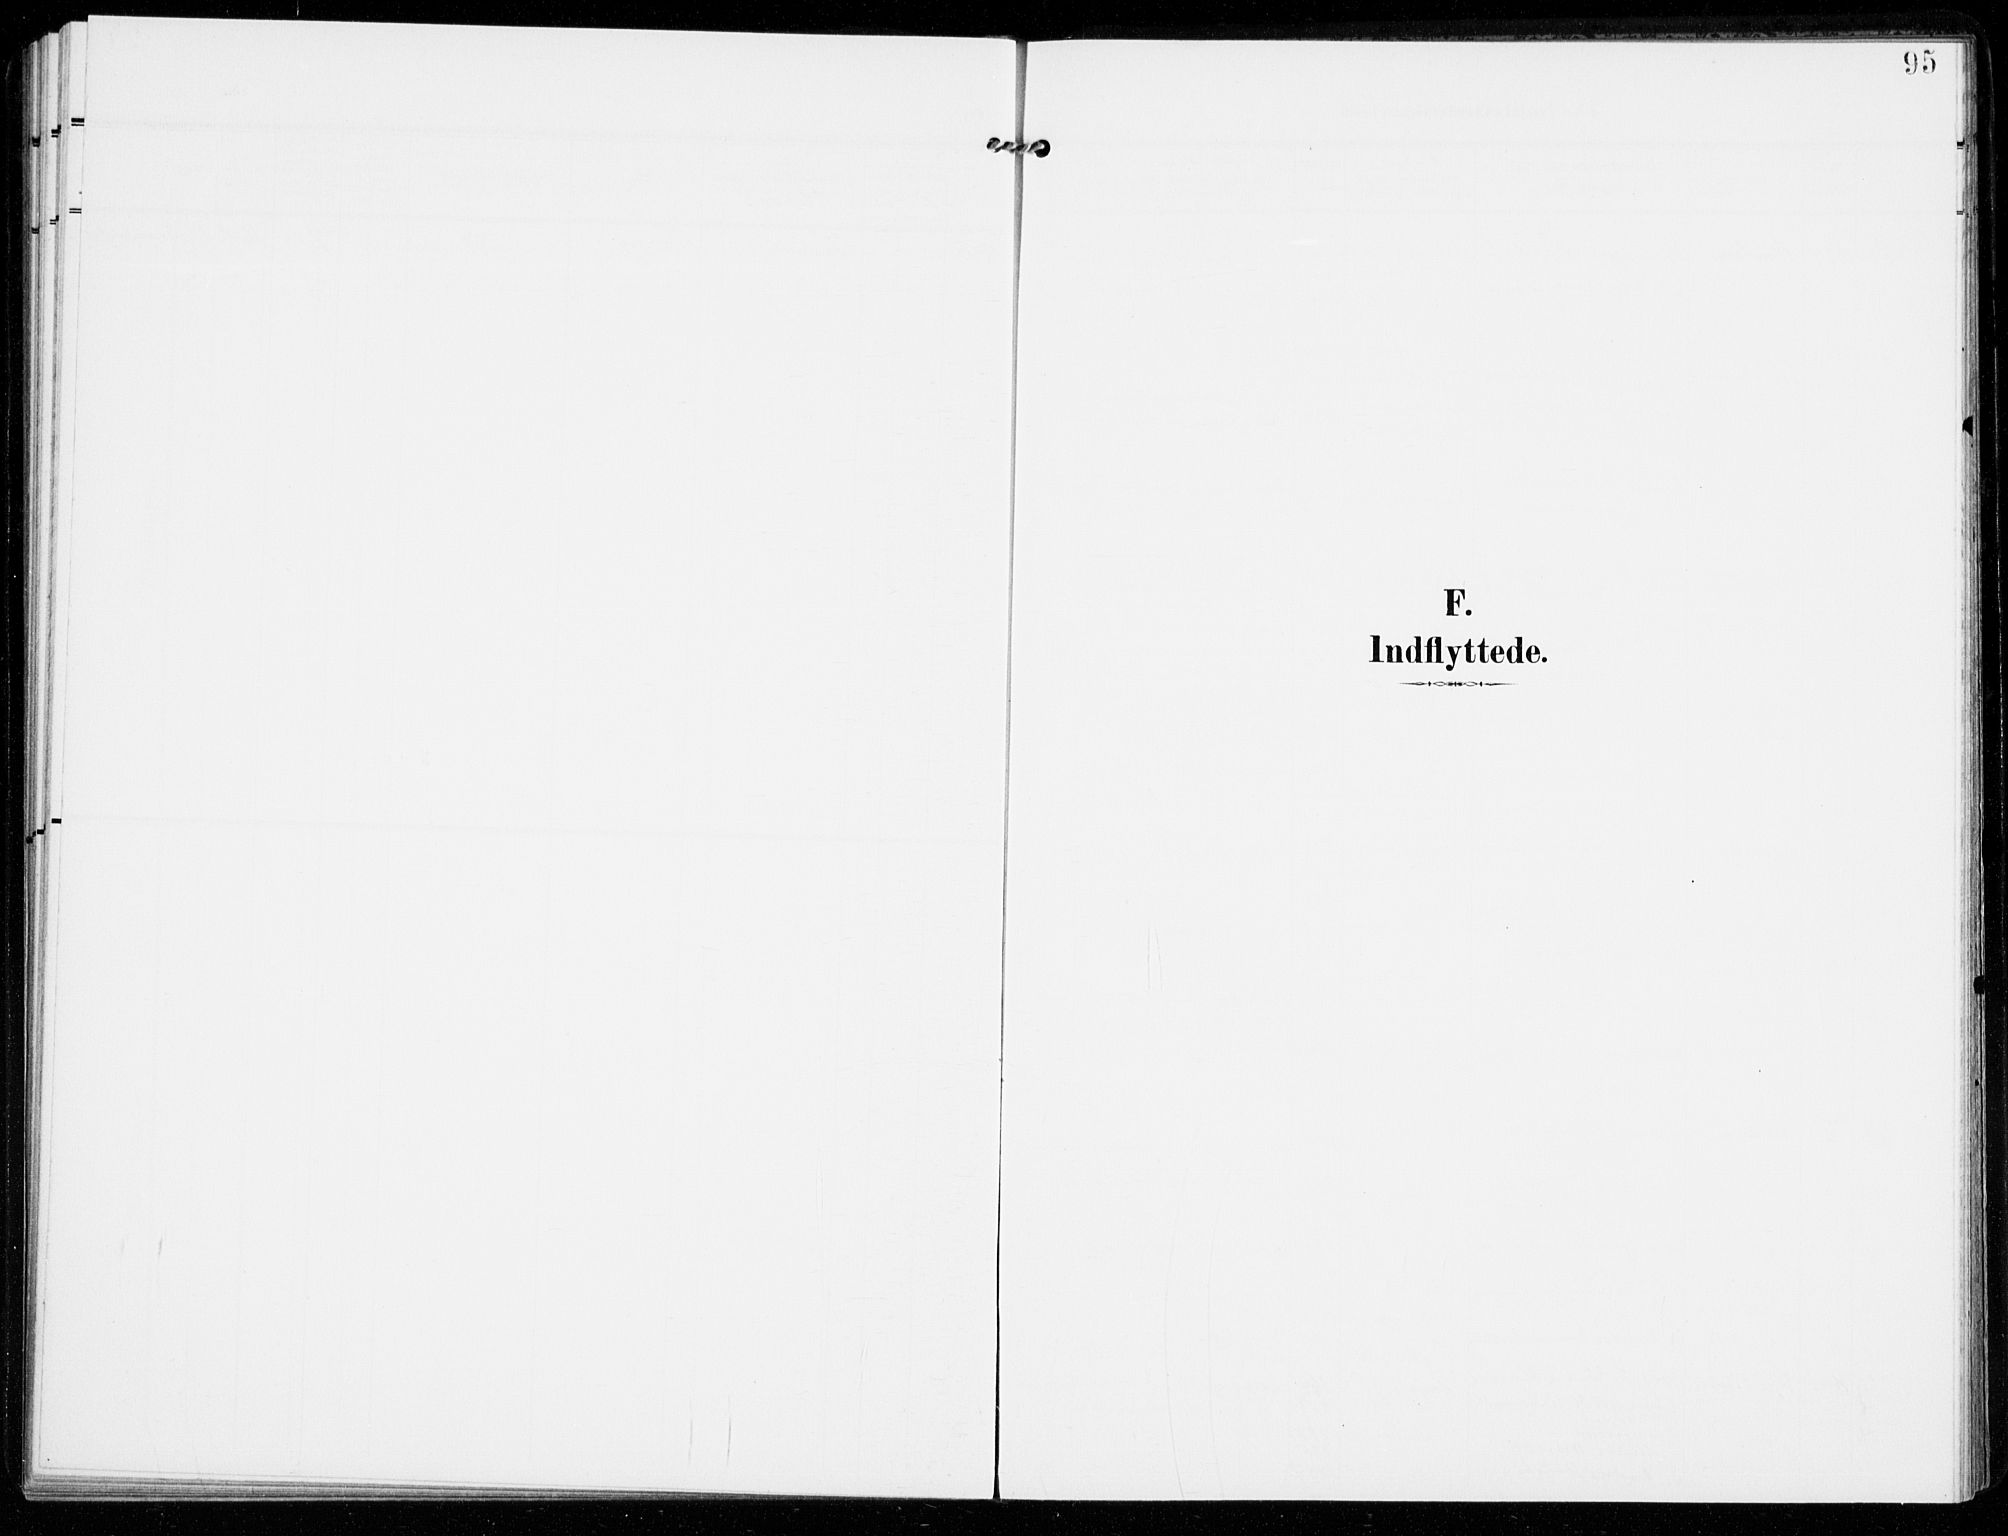 SAKO, Sandar kirkebøker, F/Fa/L0019: Parish register (official) no. 19, 1908-1914, p. 95